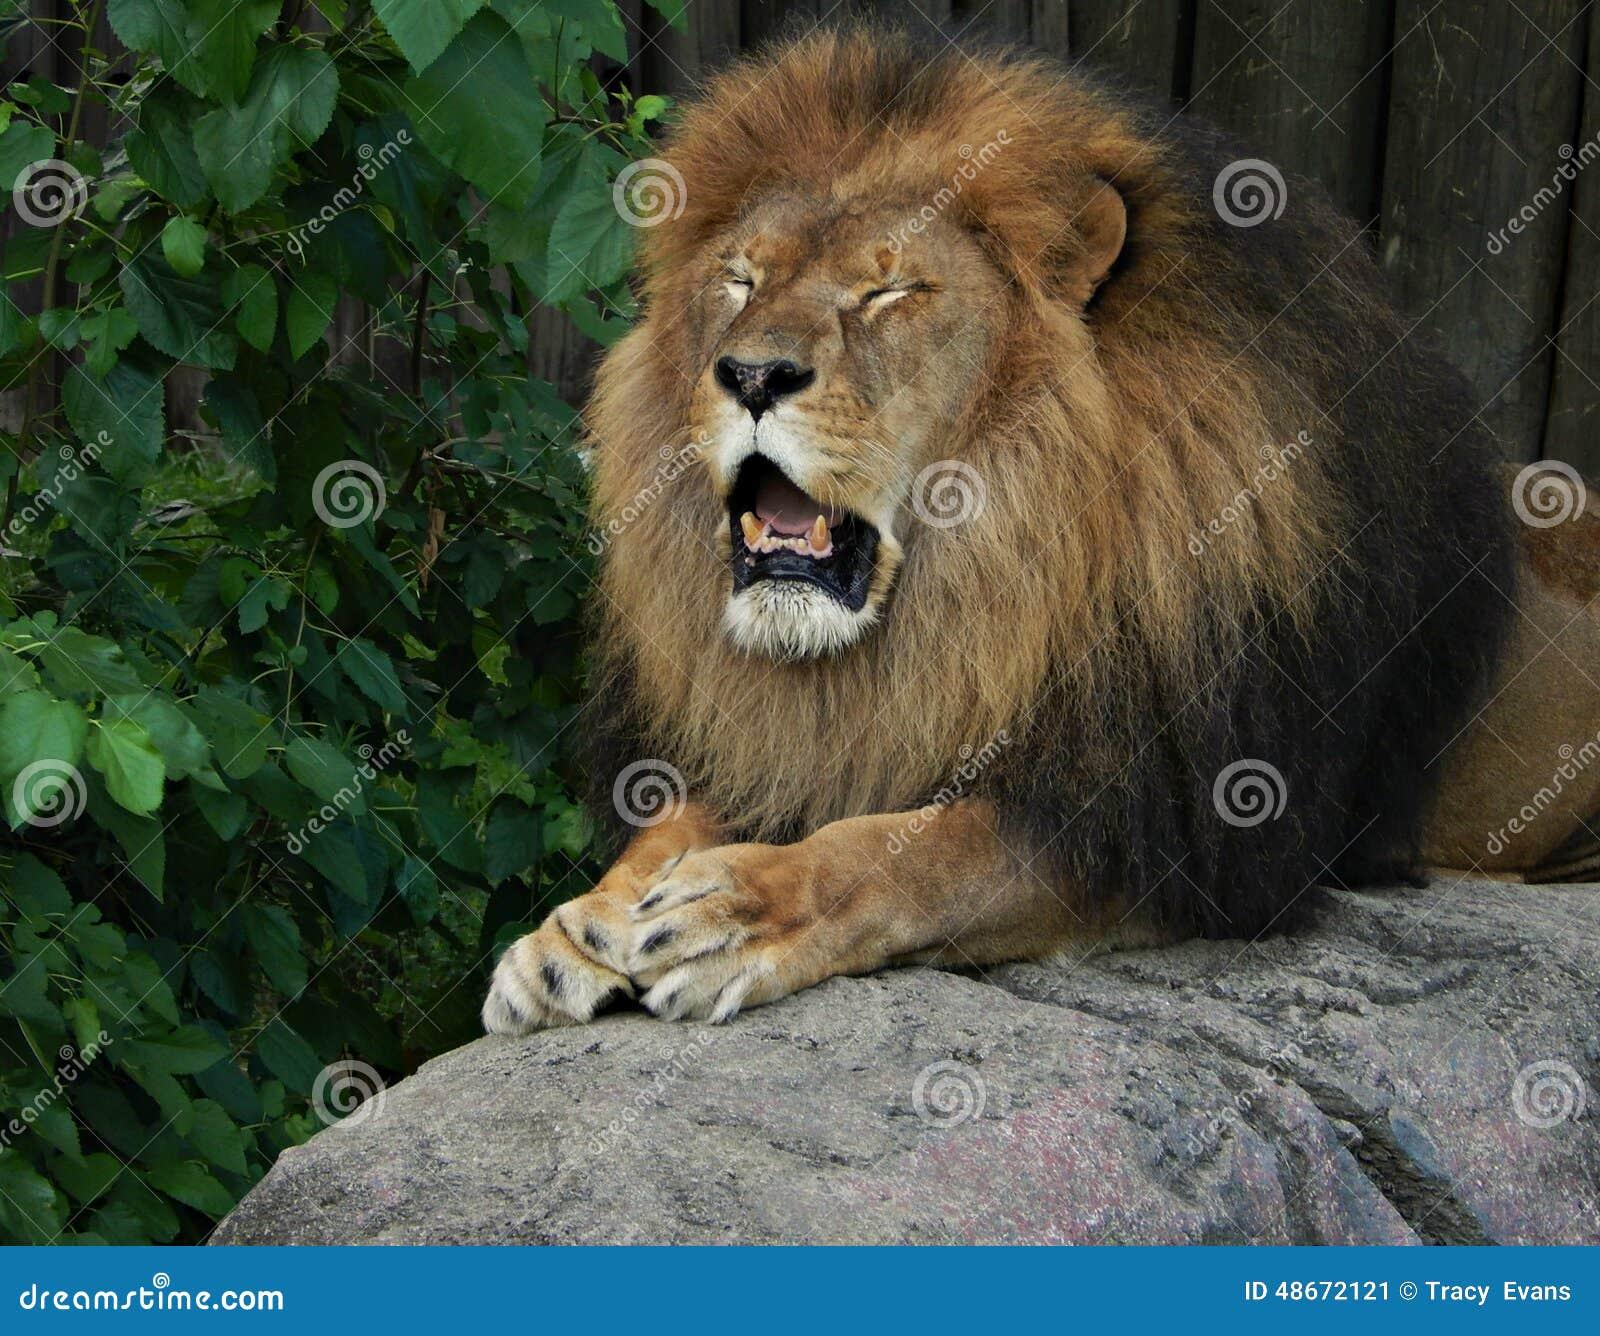 Pride Landers  The Lion Guard Wiki  FANDOM powered by Wikia